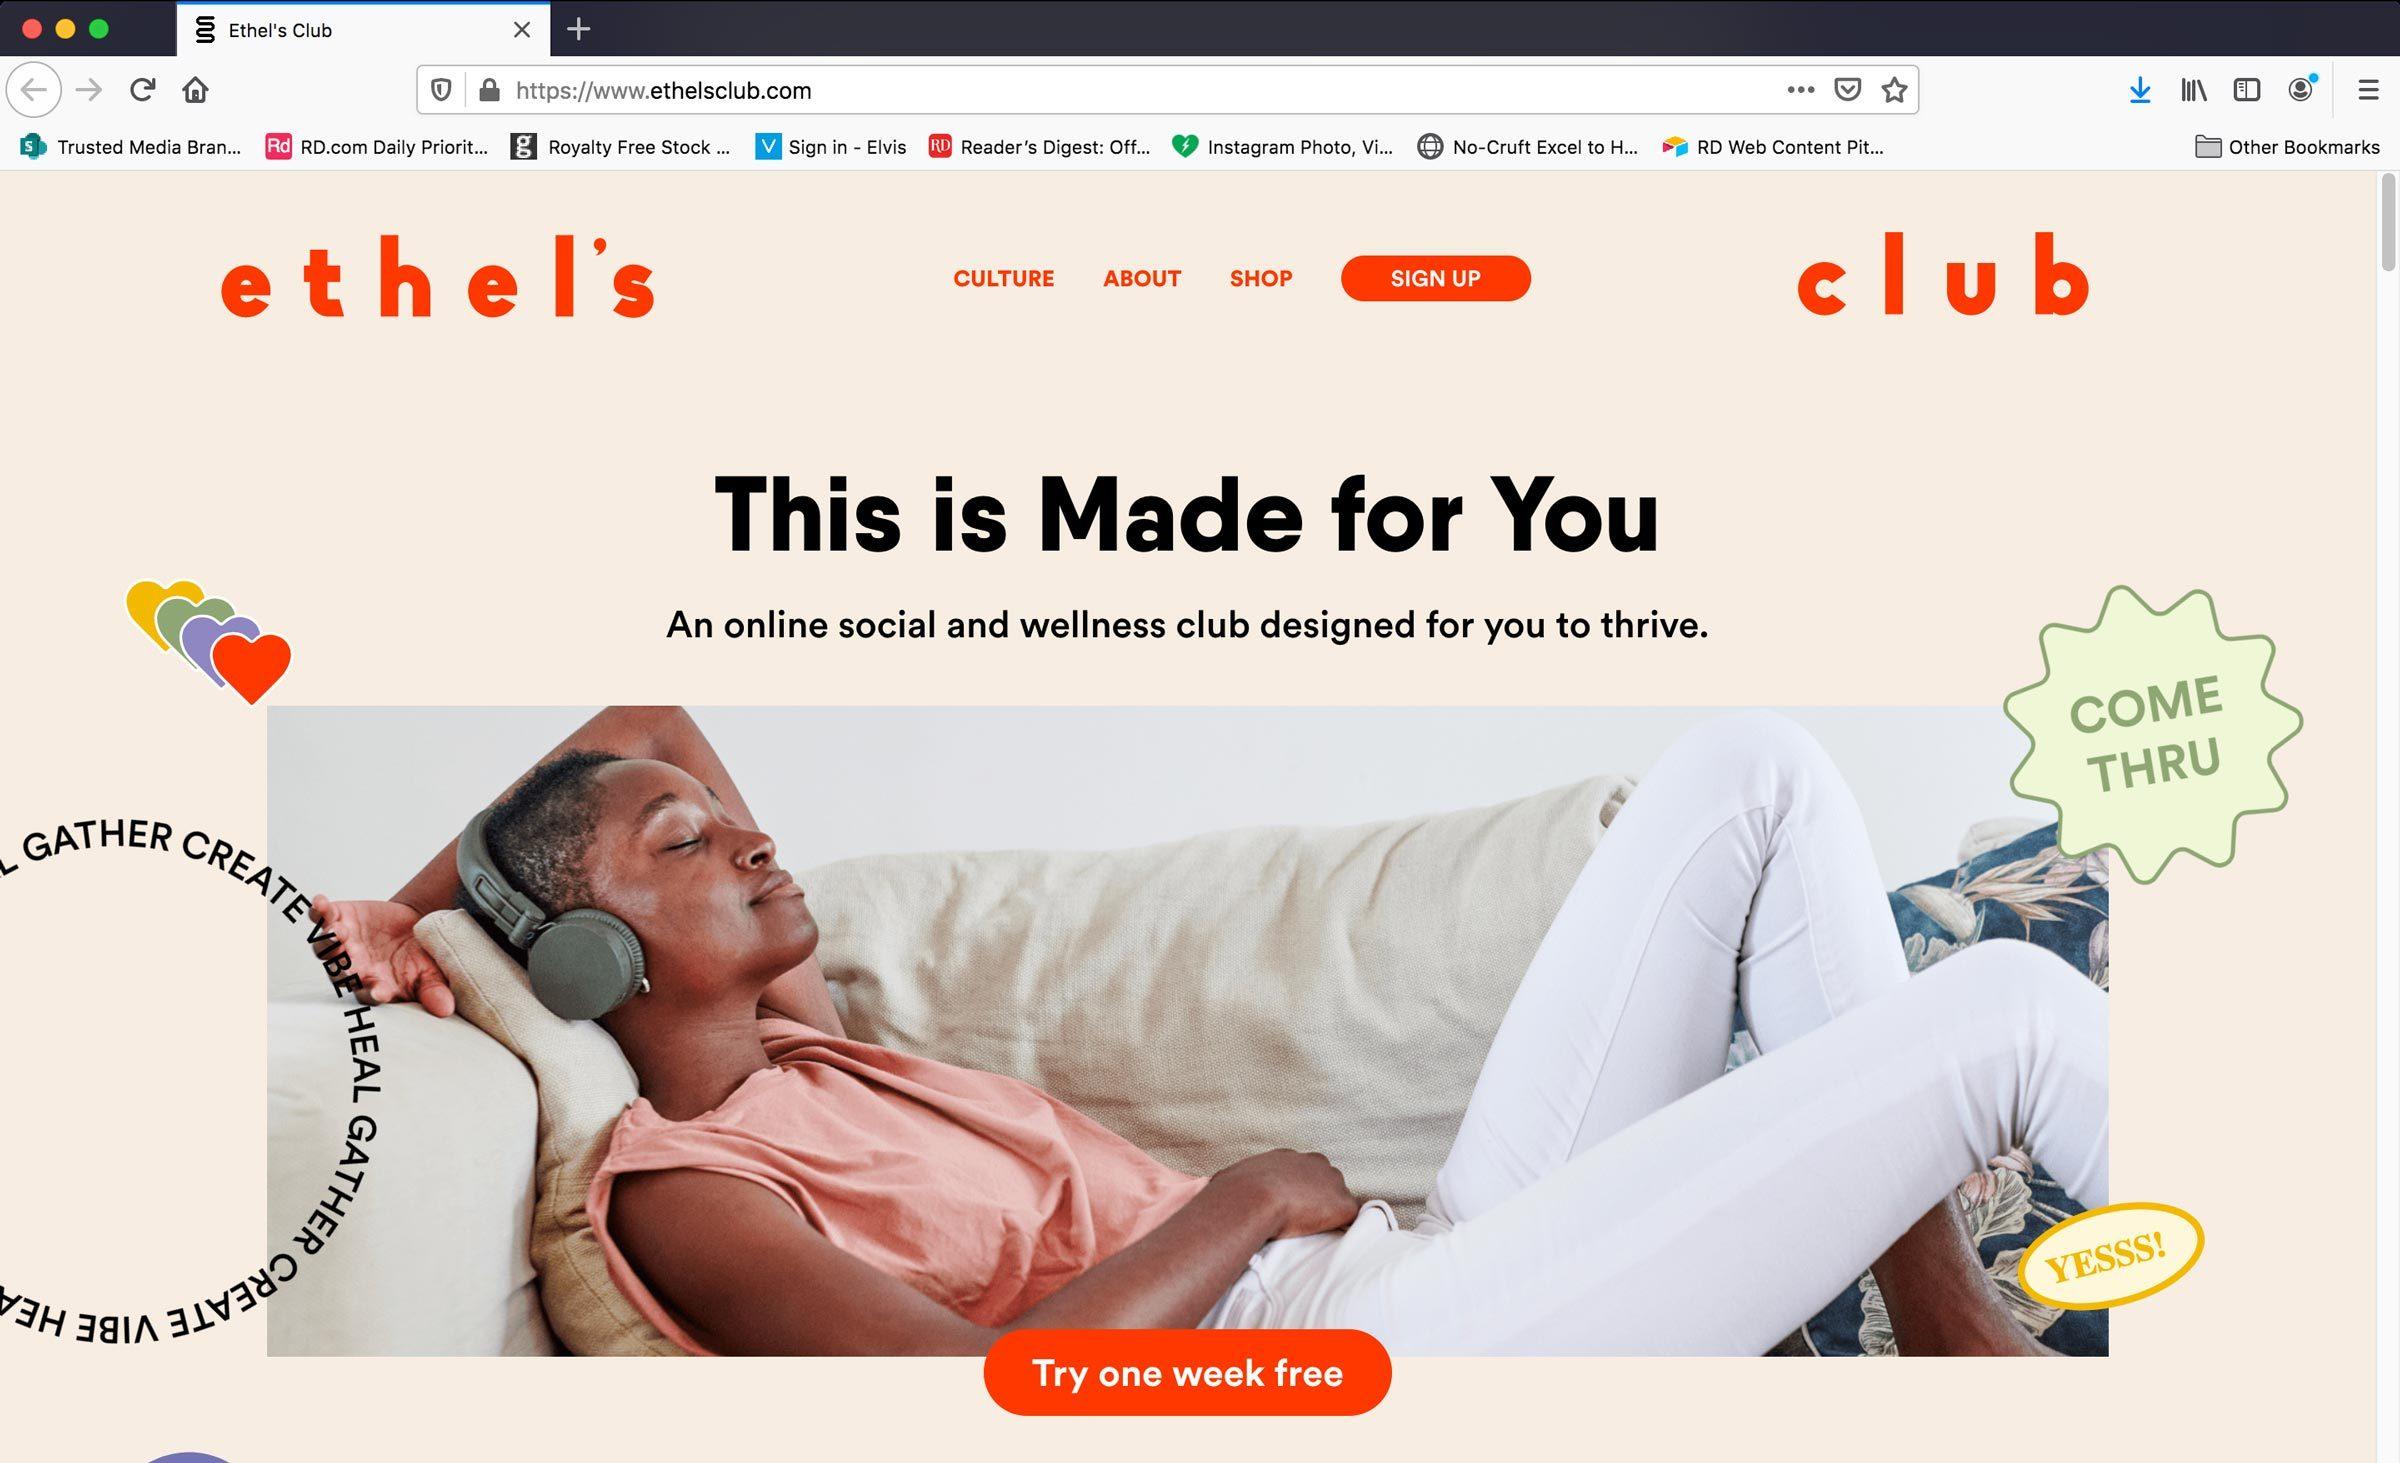 Home Page Of Ethelsclub.com